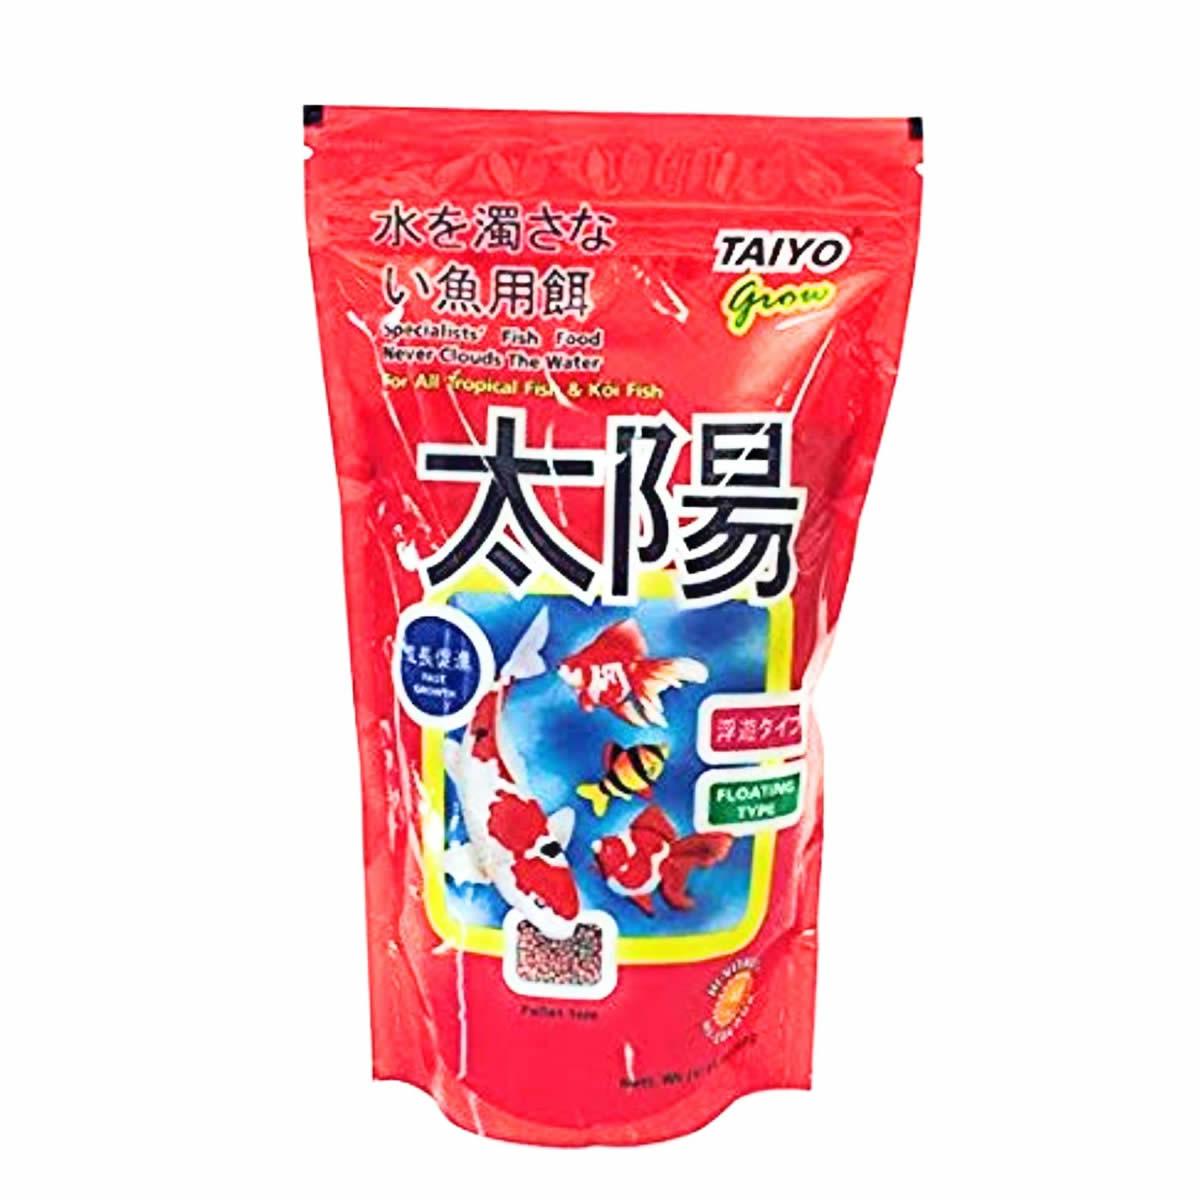 Taiyo Mixed Food Pouch 500g